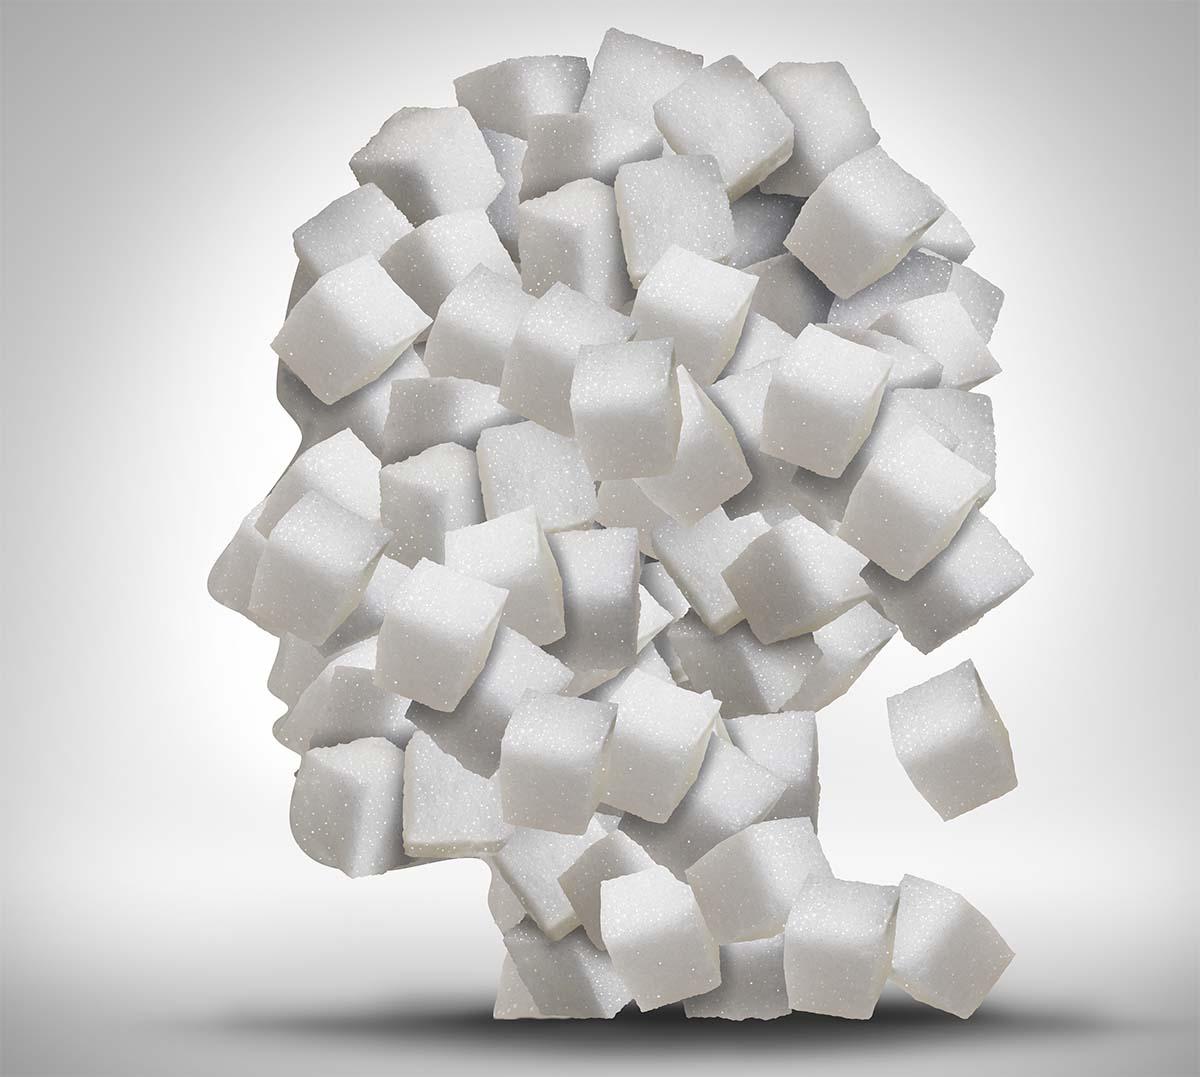 Sugar can wreak havoc on your dental health.